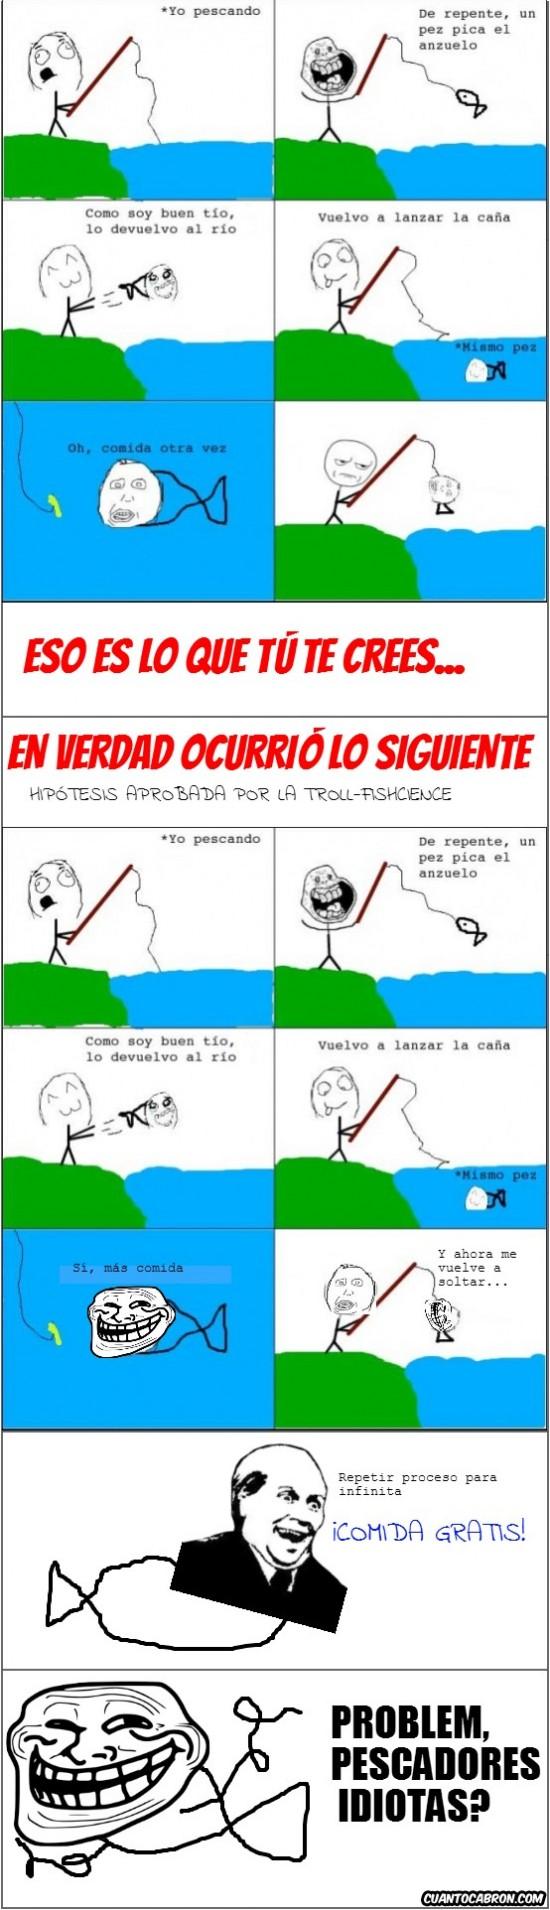 comida,gratis,idiota,its free,pescar,pez,troll